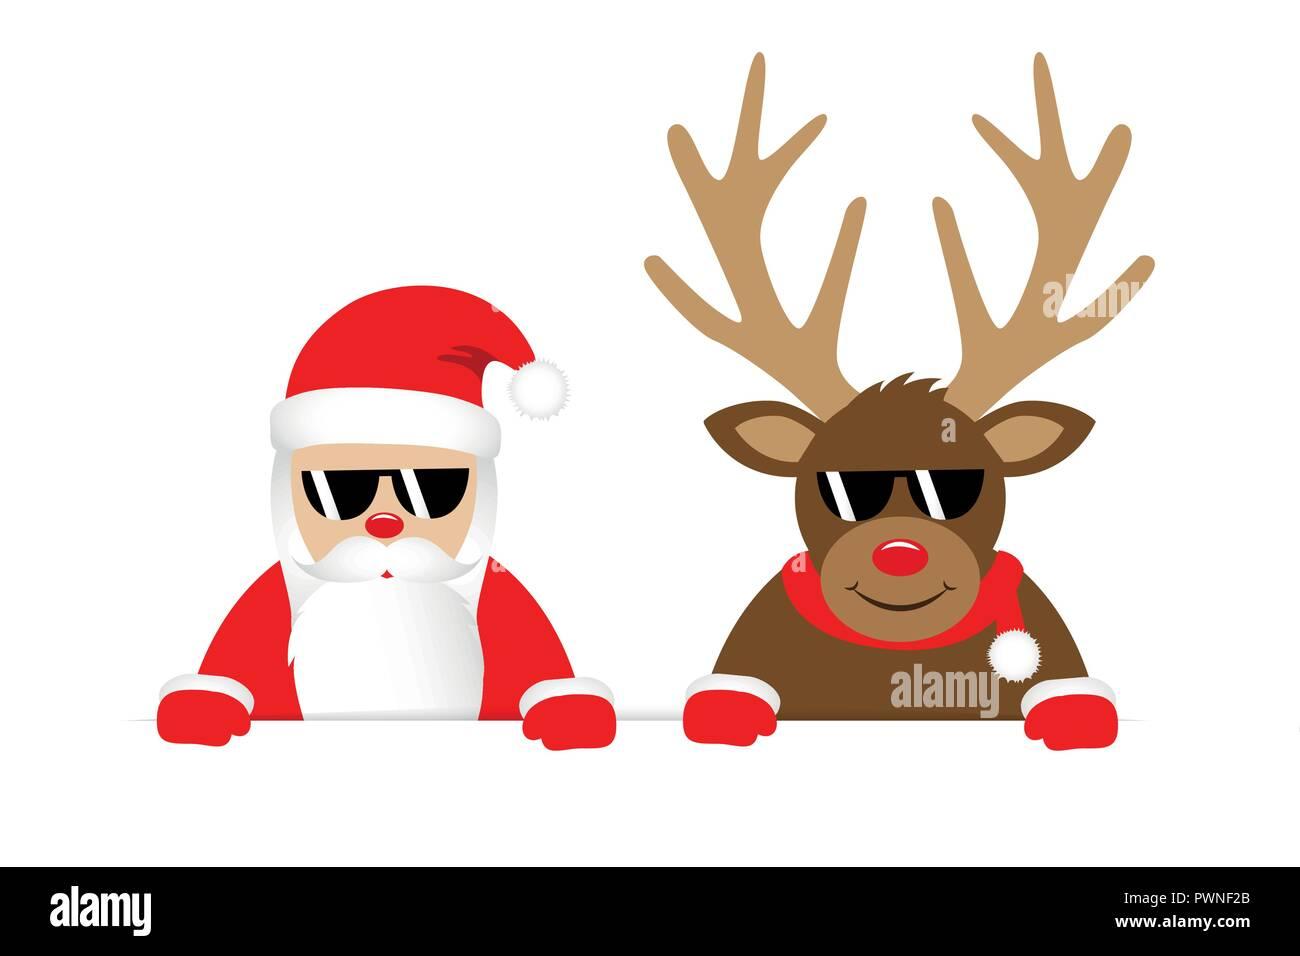 Reindeer And Santa Claus With Sunglasses Christmas Cartoon